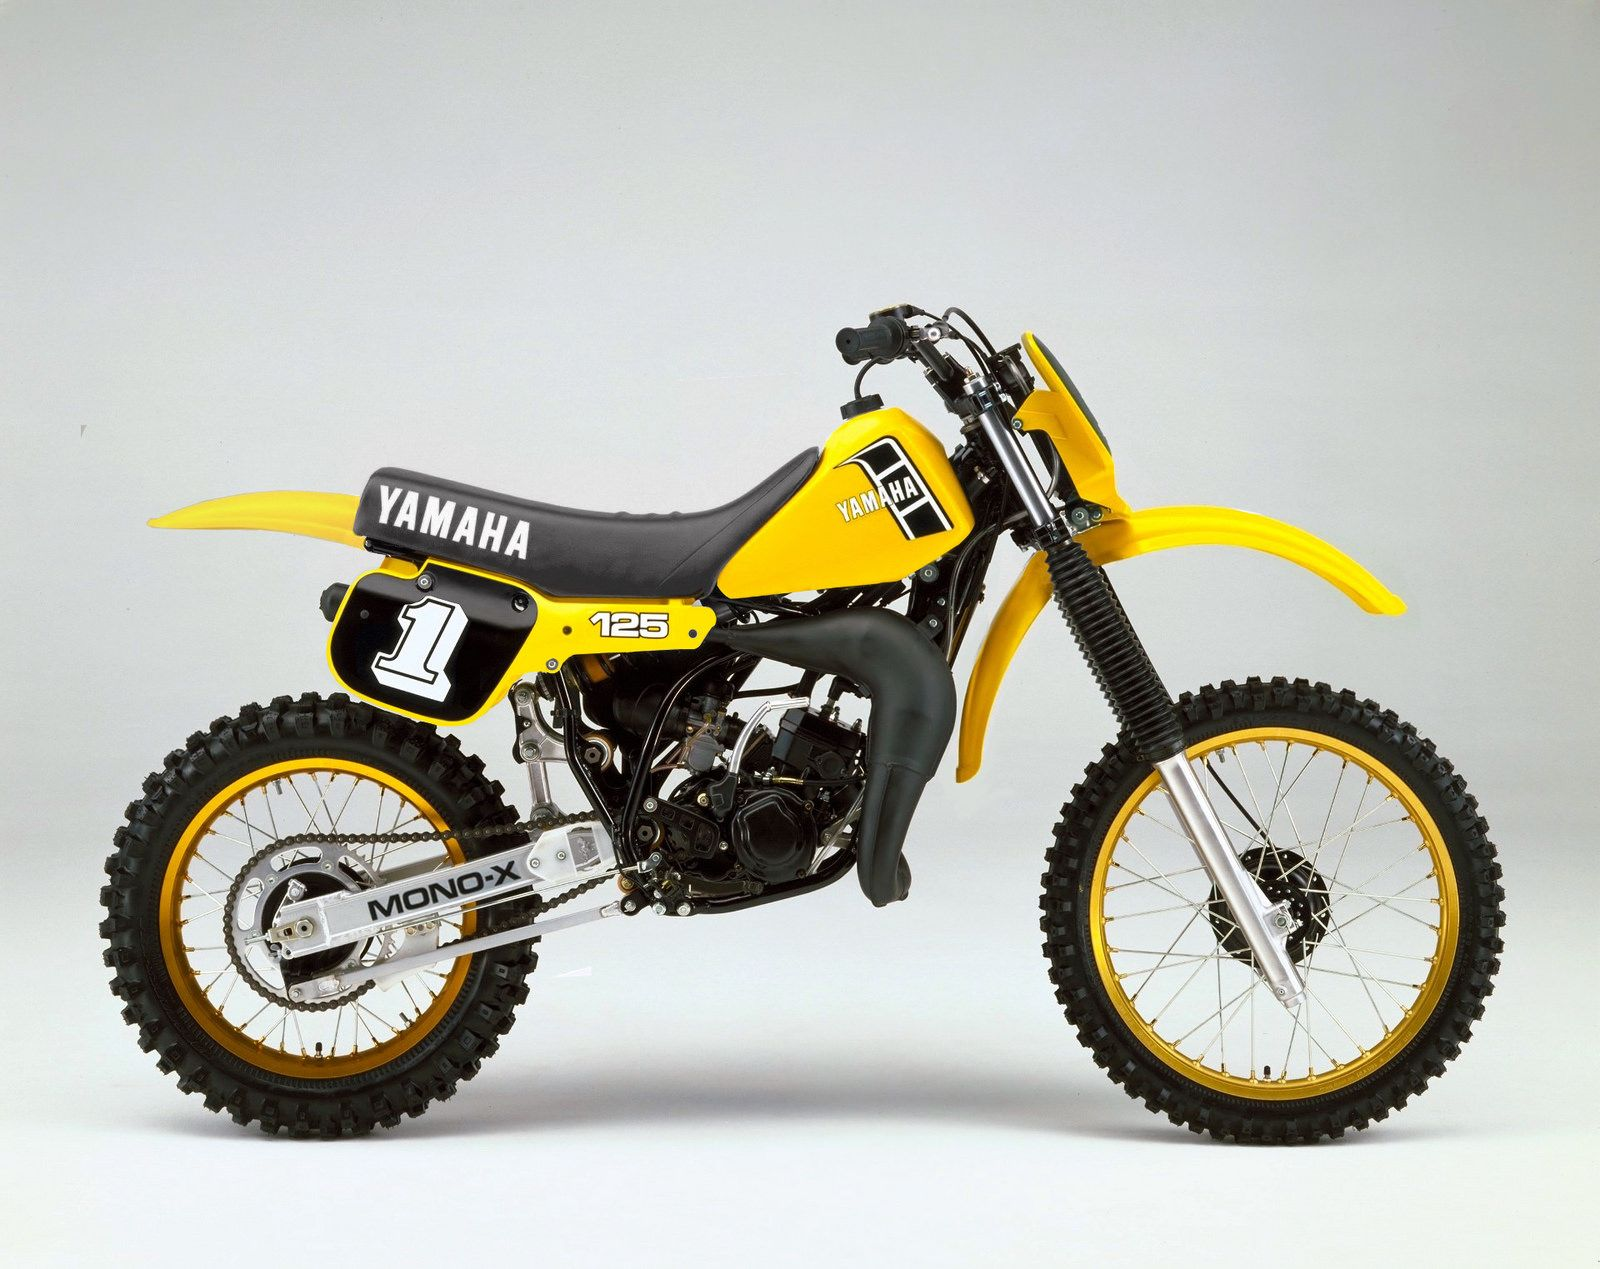 1982 Yamaha Yz125 Yamaha Yamaha Motocross Vintage Motocross